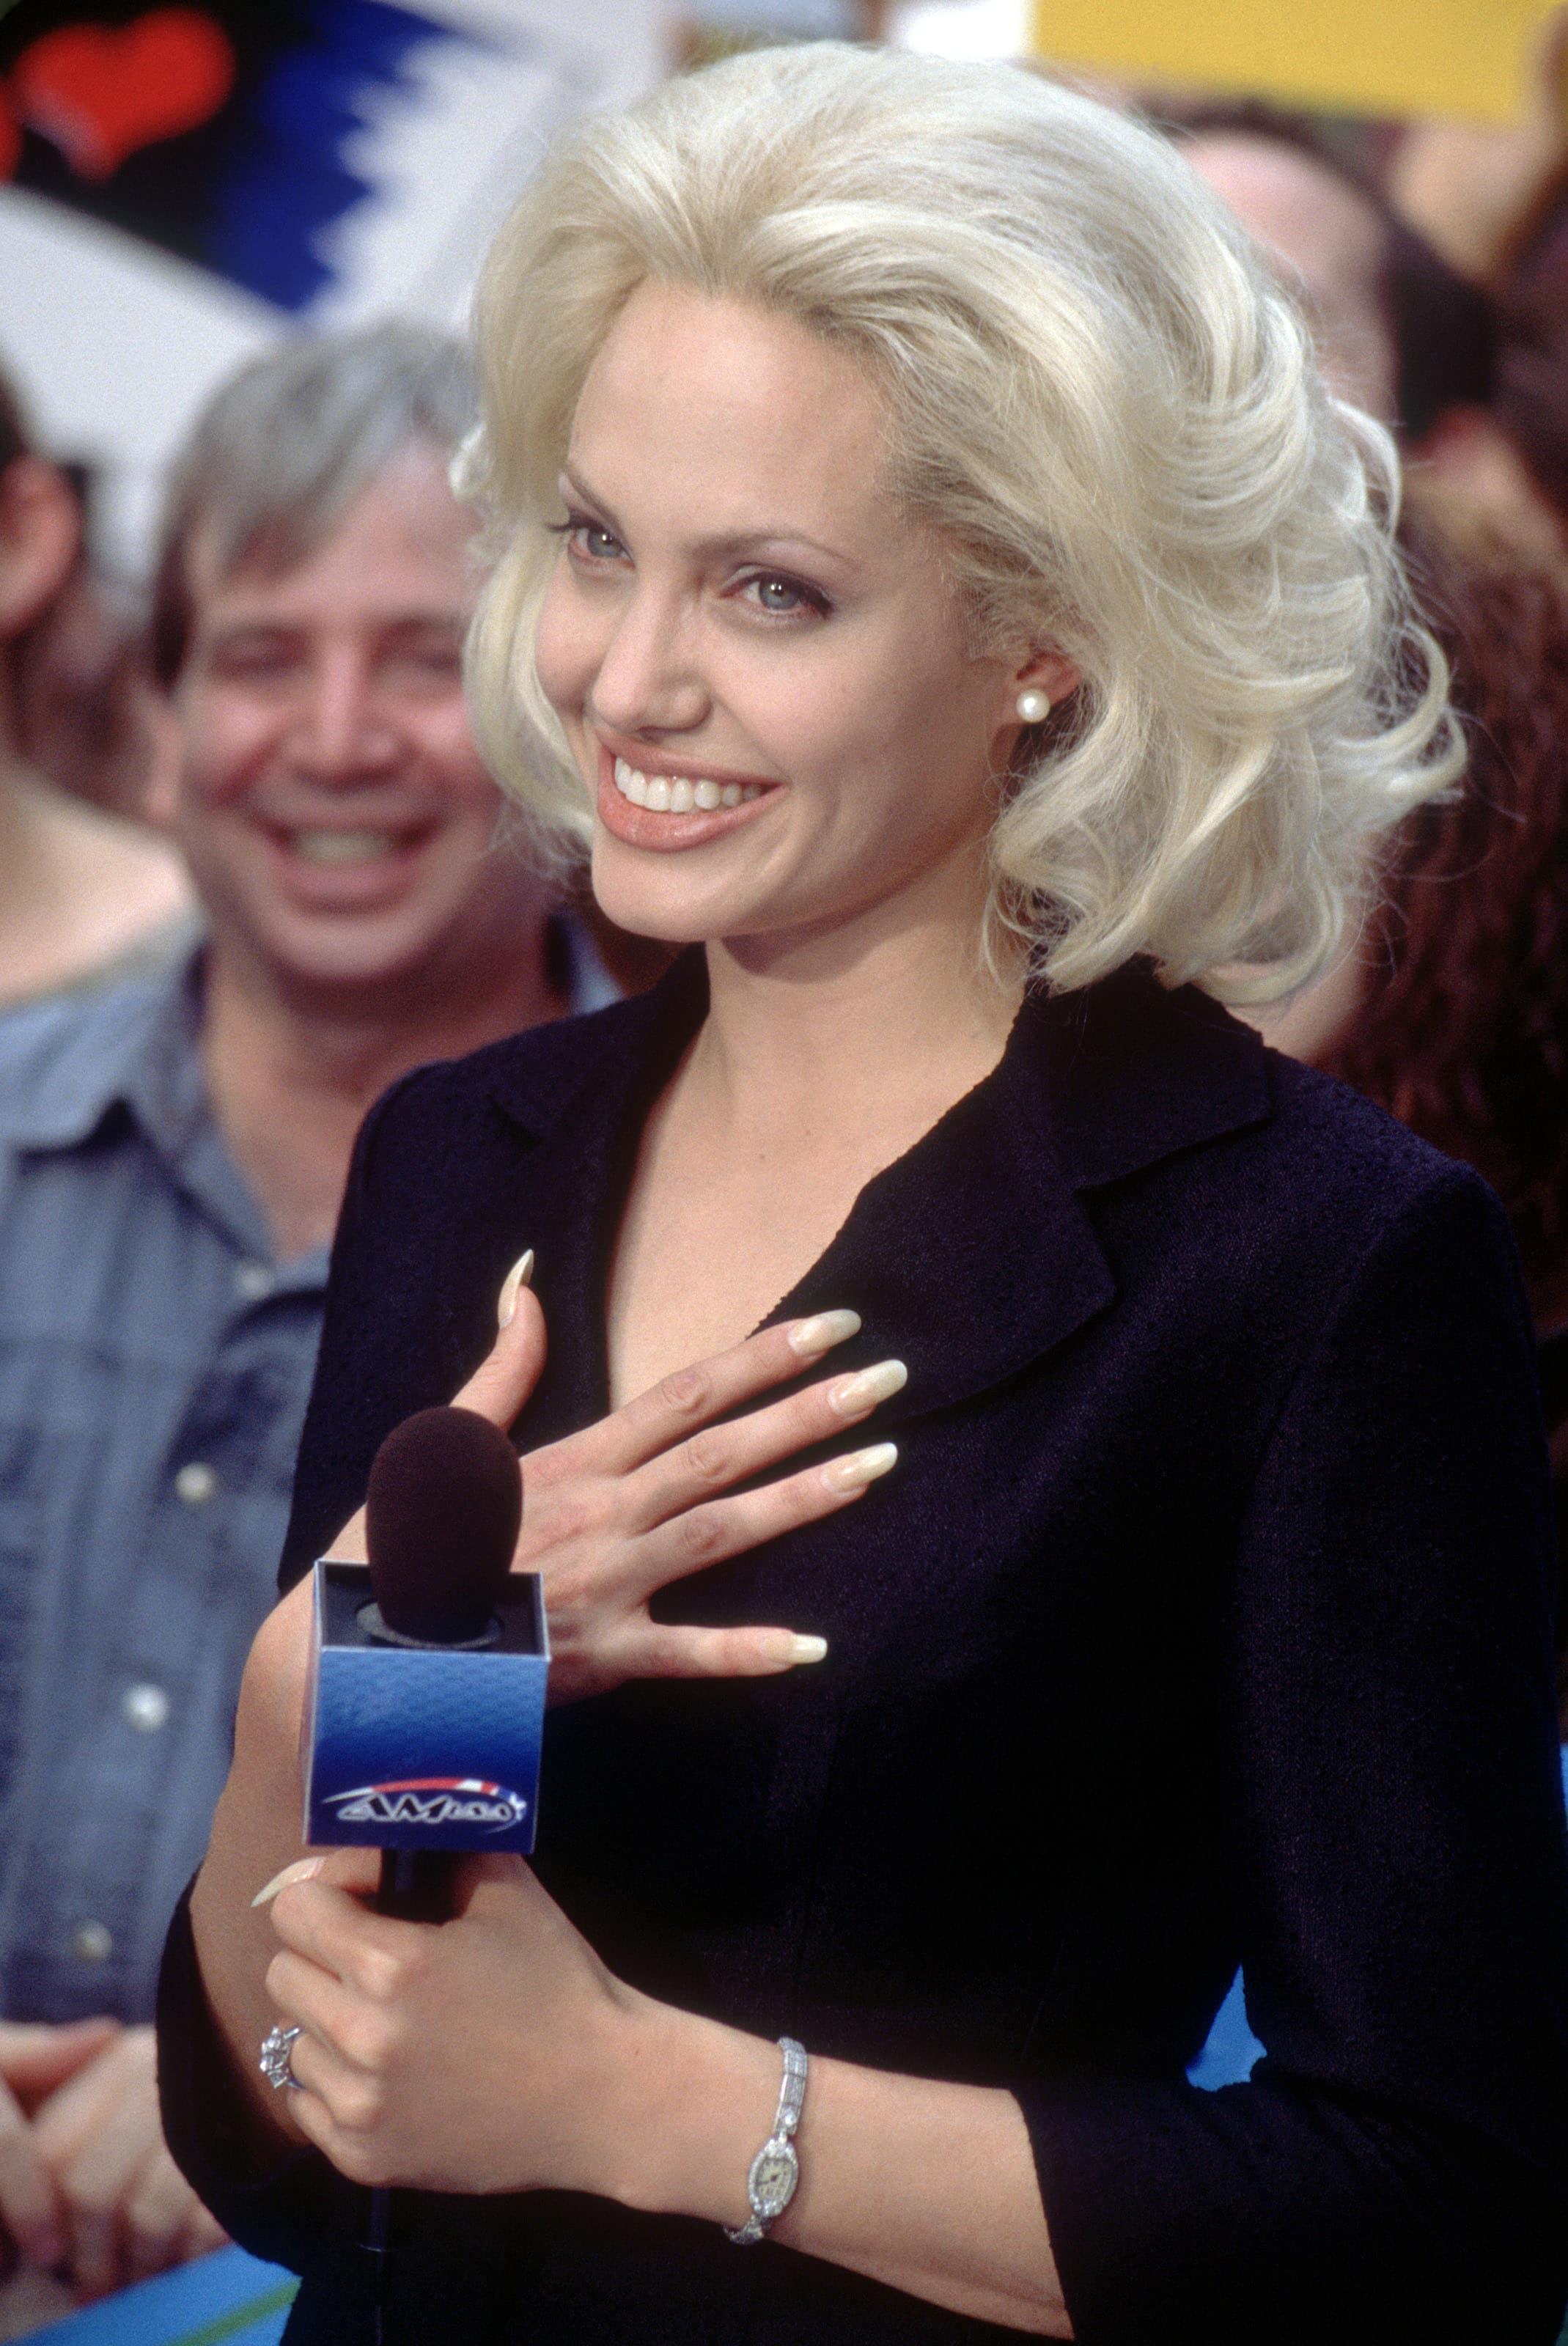 blonde-bob-volume-wavy-hair Прически для квадратного лица - фото стрижек на квадратное лицо